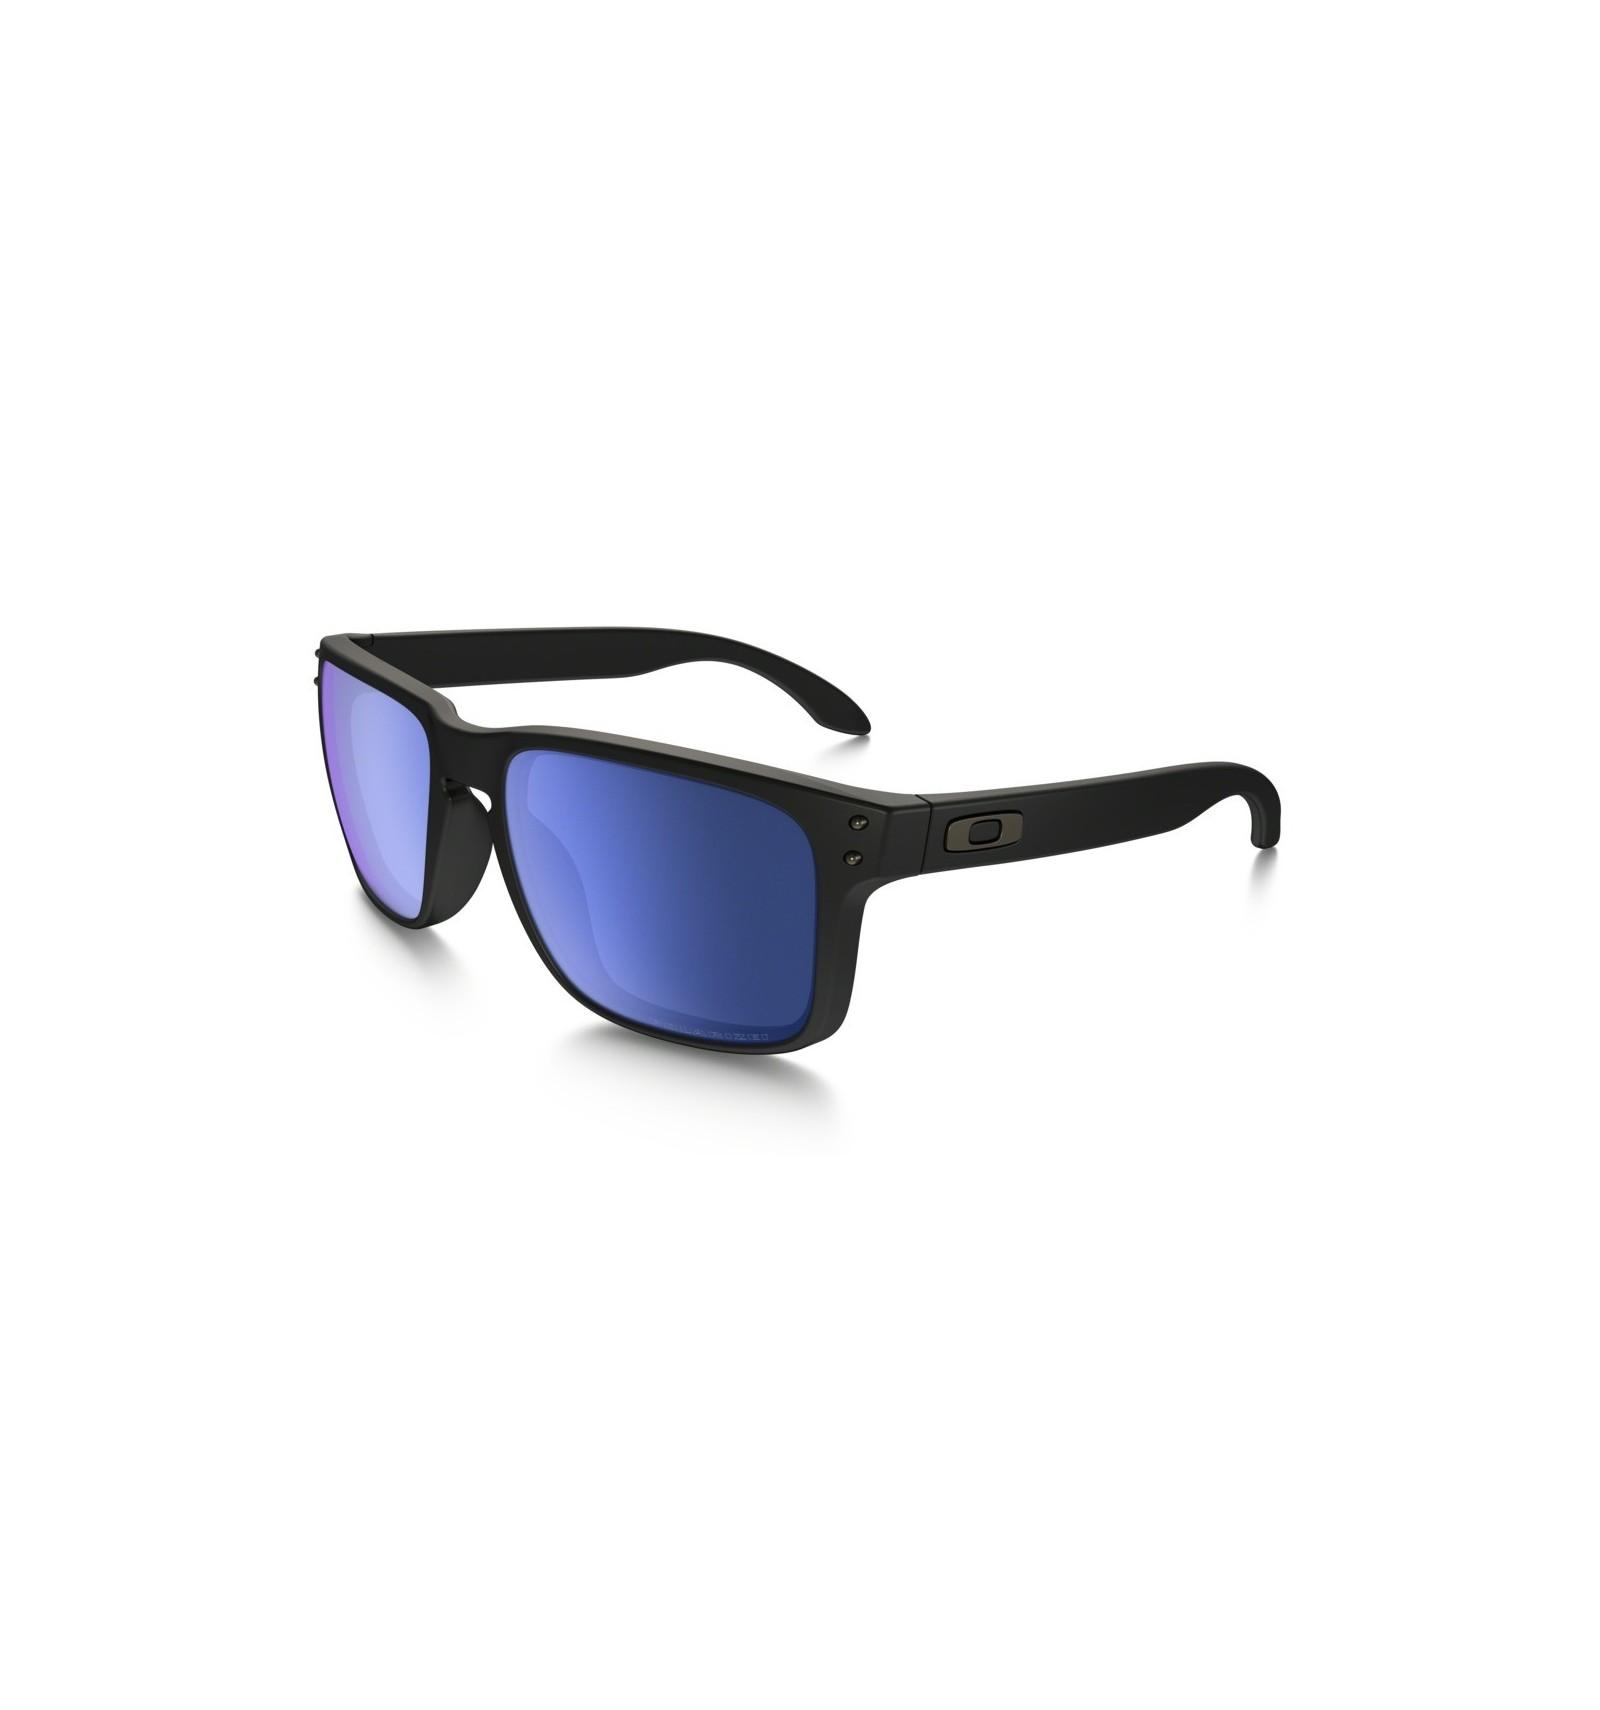 8f35f748fa261 Gafas de sol OAKLEY 9102 HOLBROOK Matte Black   Ice Iridium POLARIZADAS